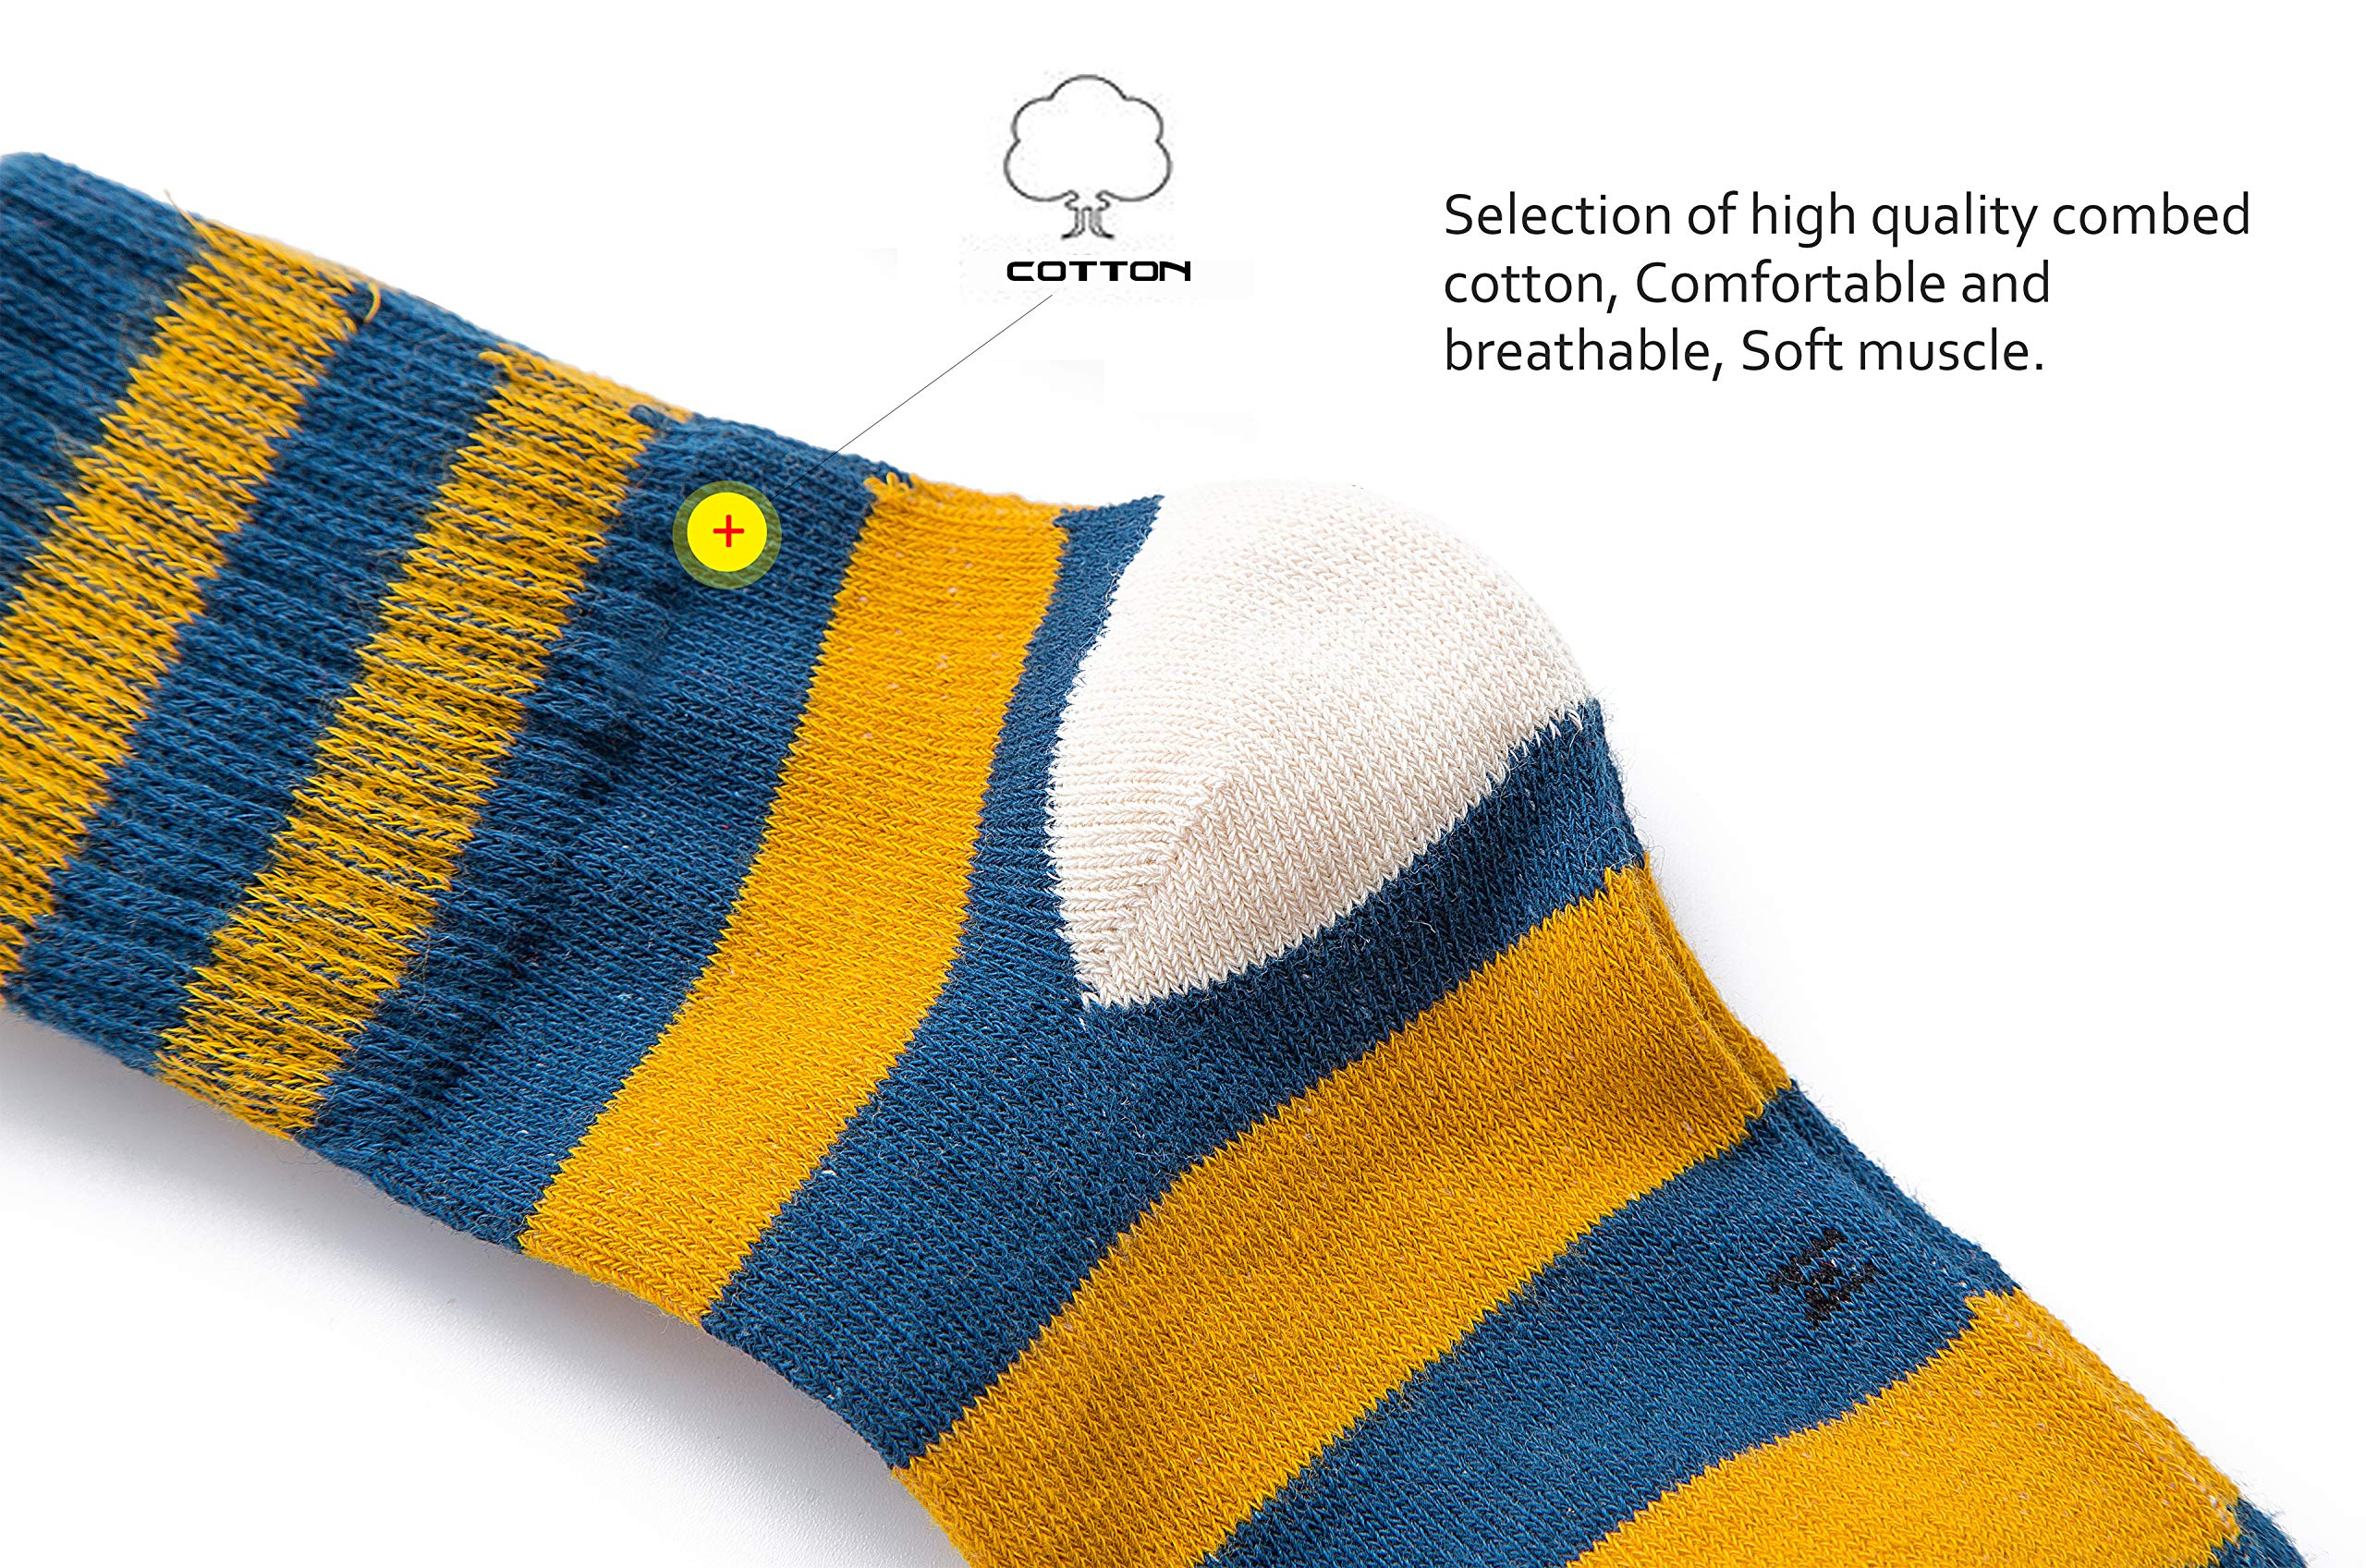 Maplewel Girls Socks Kids Colorful Cotton Crew Seamless Socks 5 Pairs (5 year - 7 year)